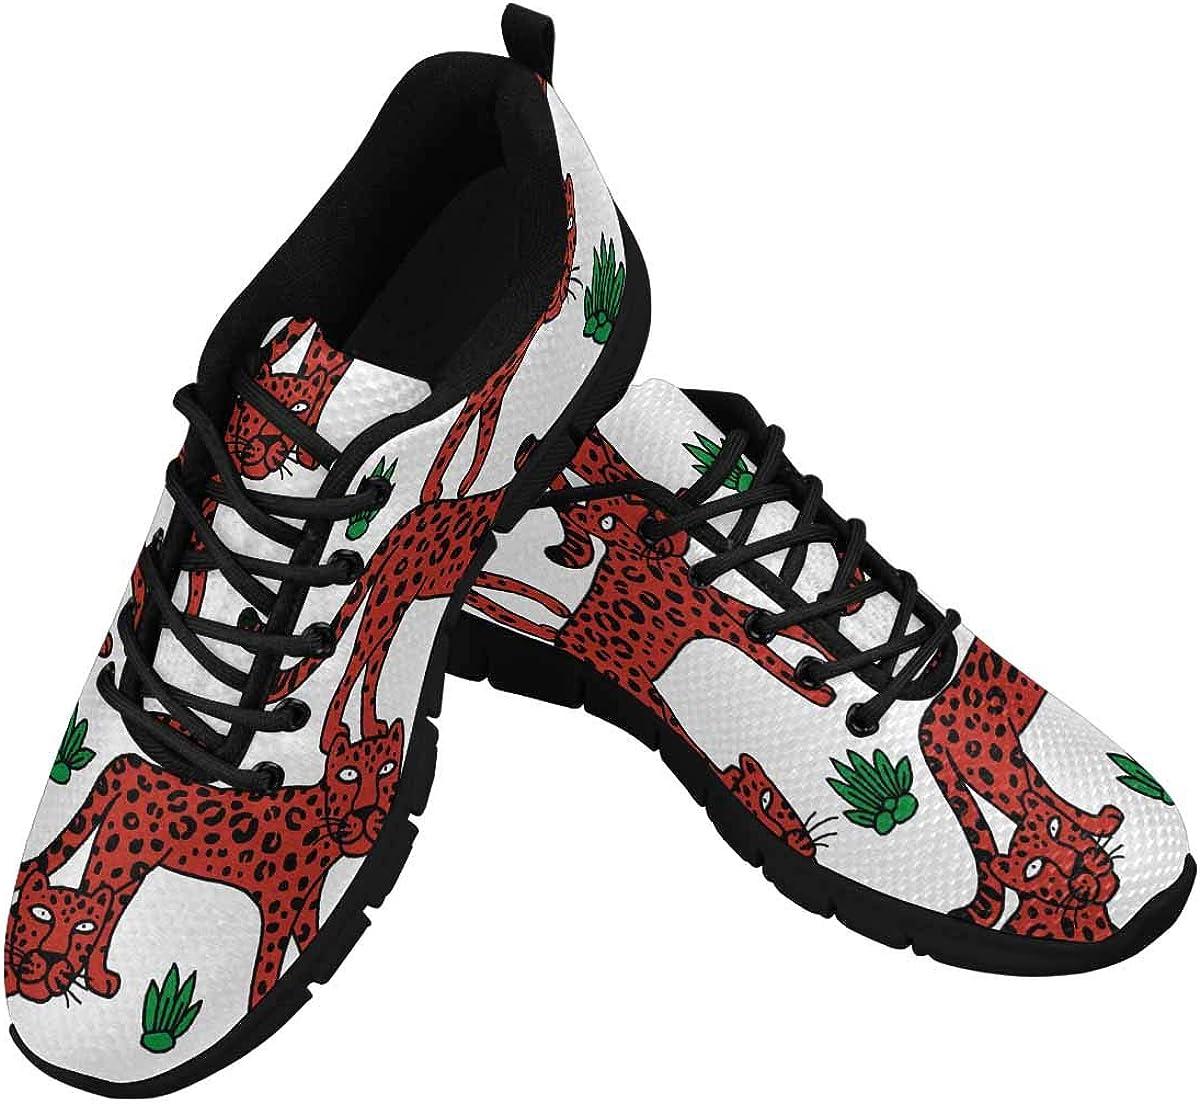 INTERESTPRINT Red Leopard Women's Breathable Non Slip Sneakers